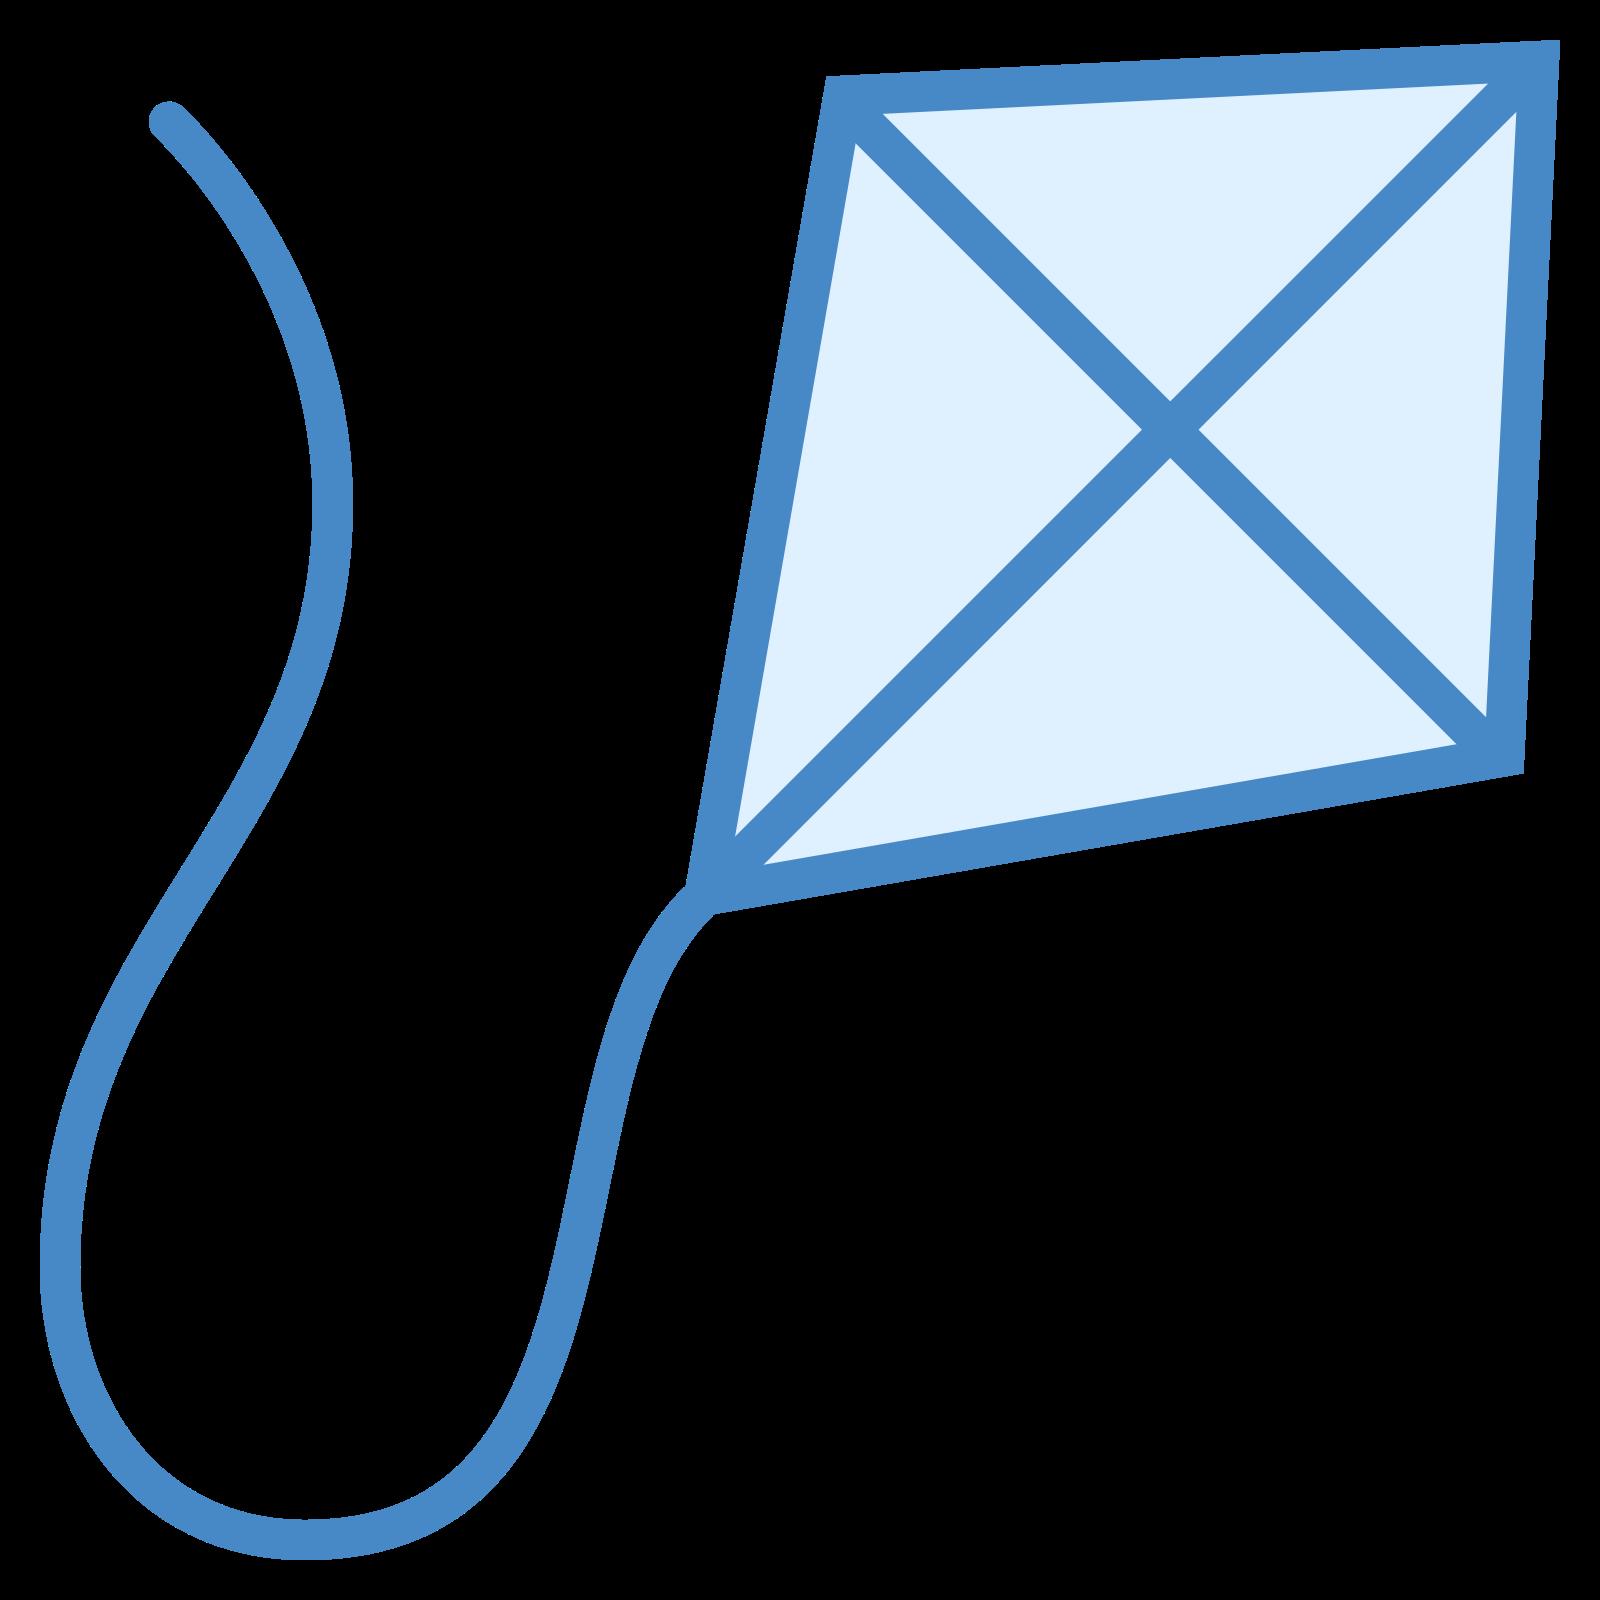 Computer icons symbol transprent. Clipart kite diamond